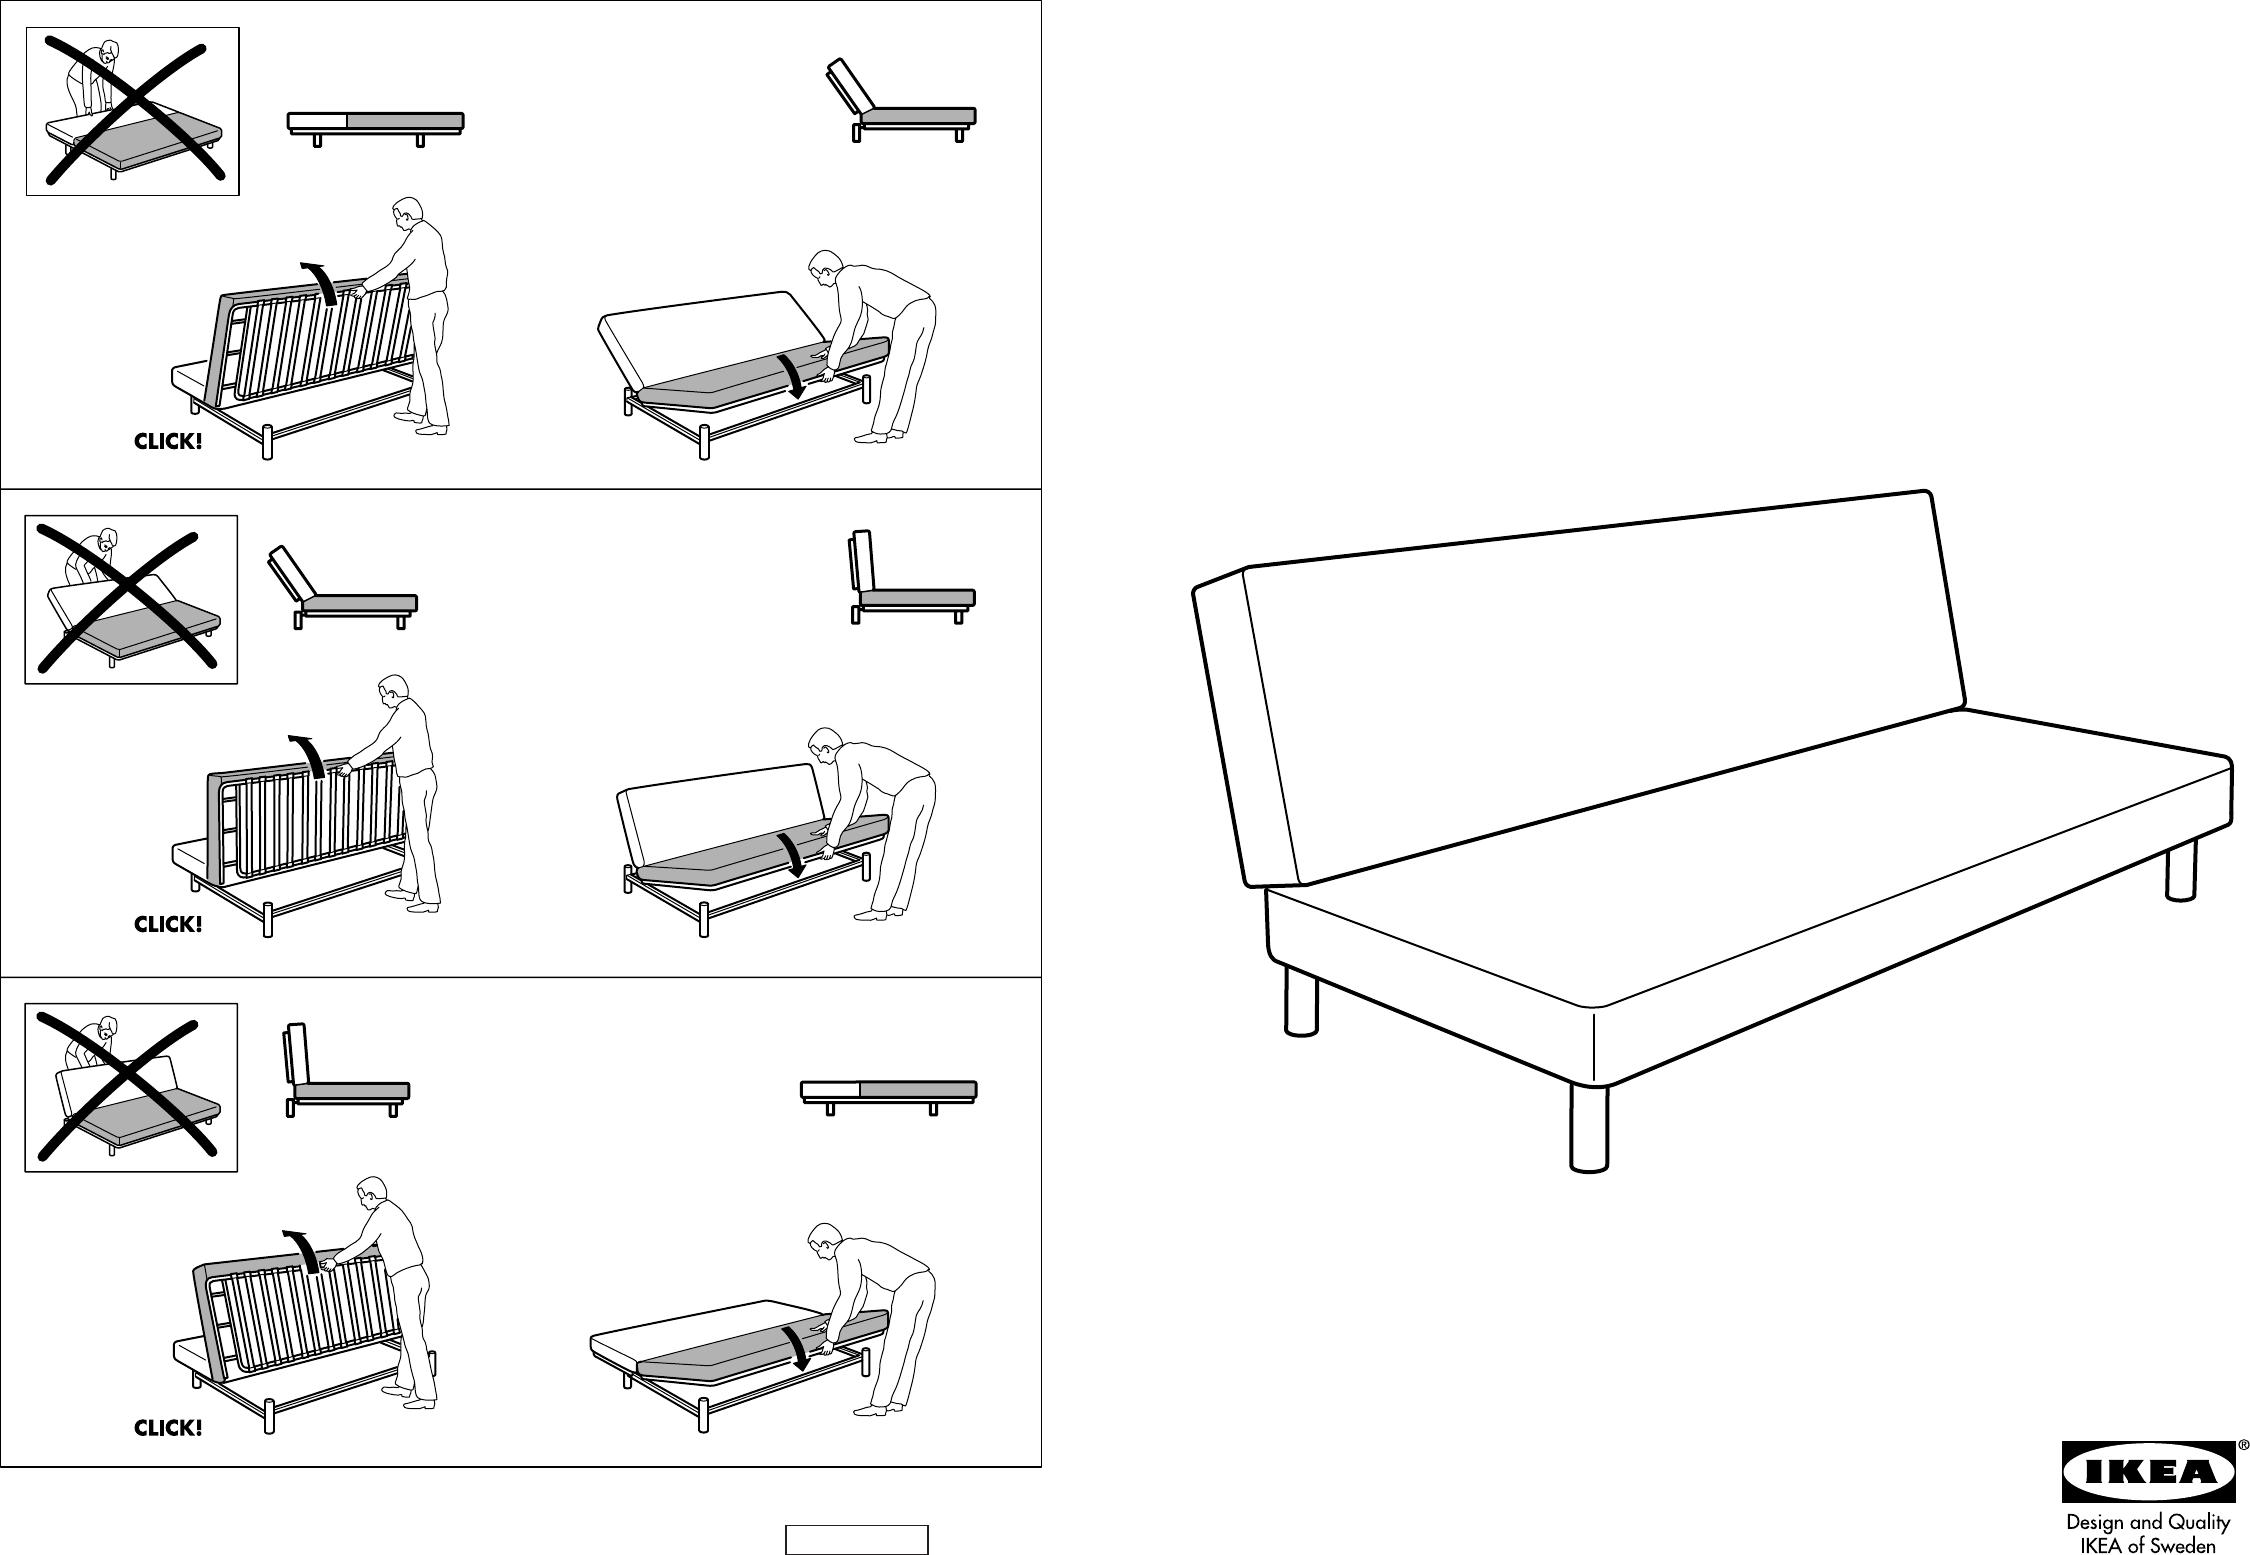 Beddinge Divano Letto Ikea.Manuale Ikea Beddinge 4 Pagine